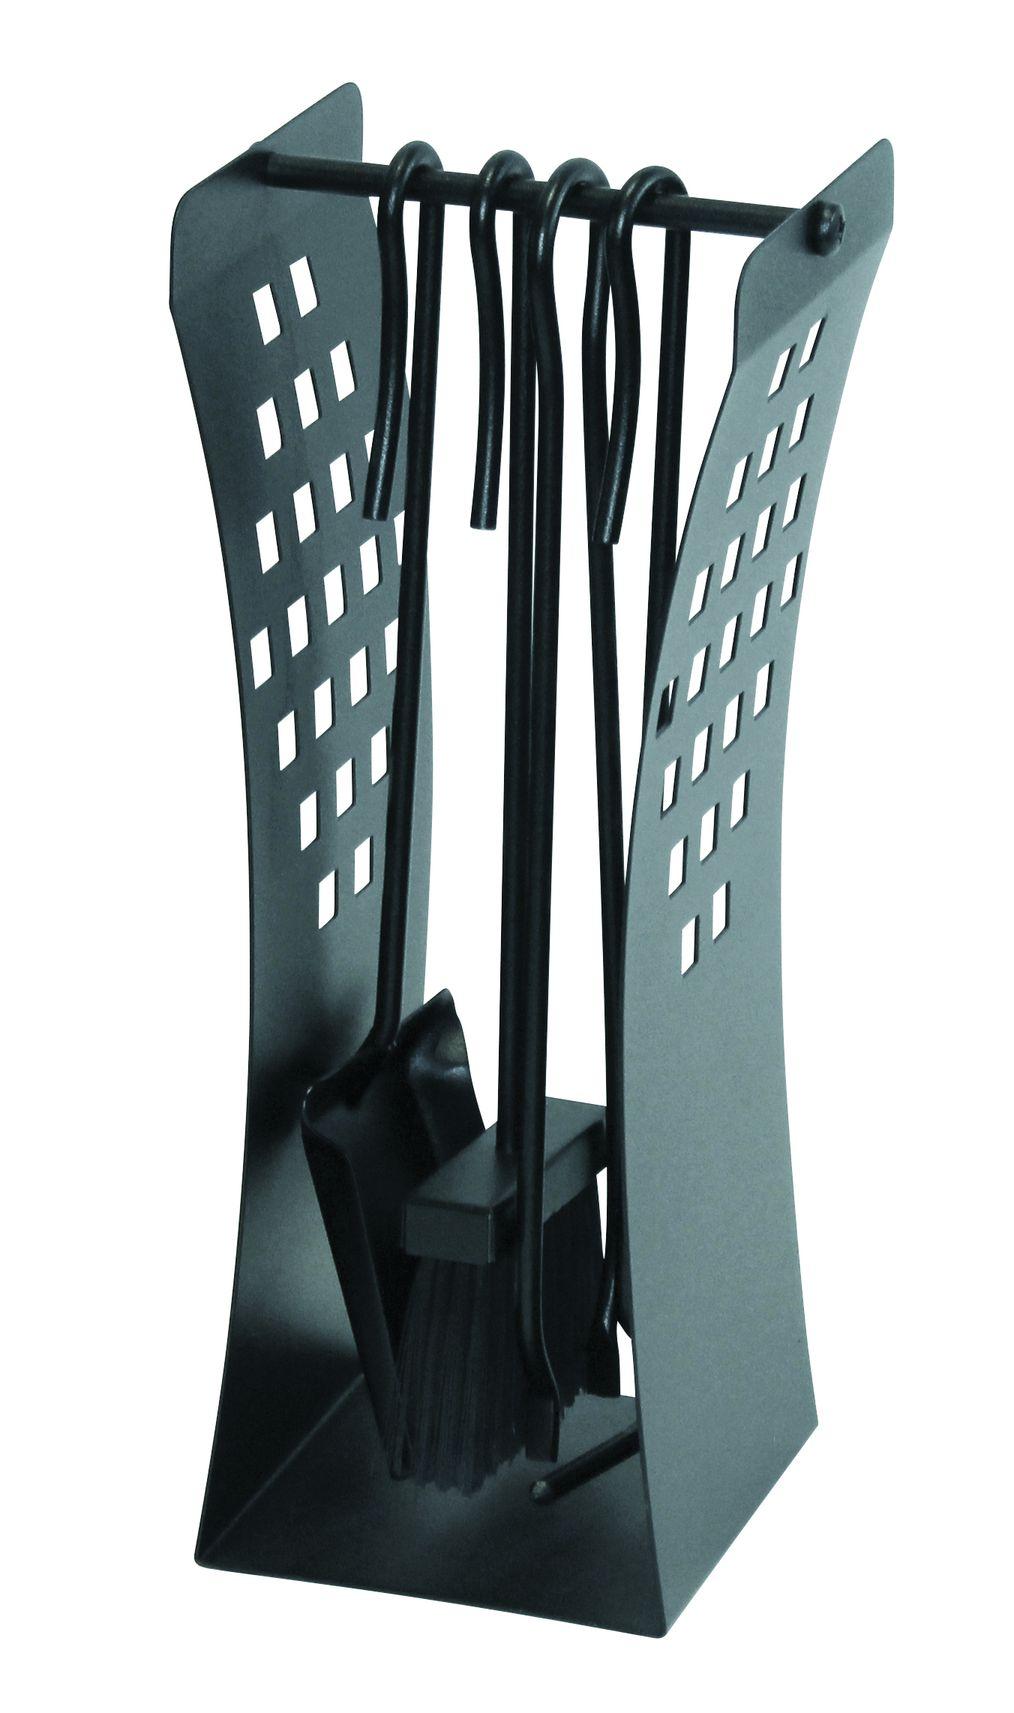 kaminbesteck lienbacher schwarz 4teilig. Black Bedroom Furniture Sets. Home Design Ideas